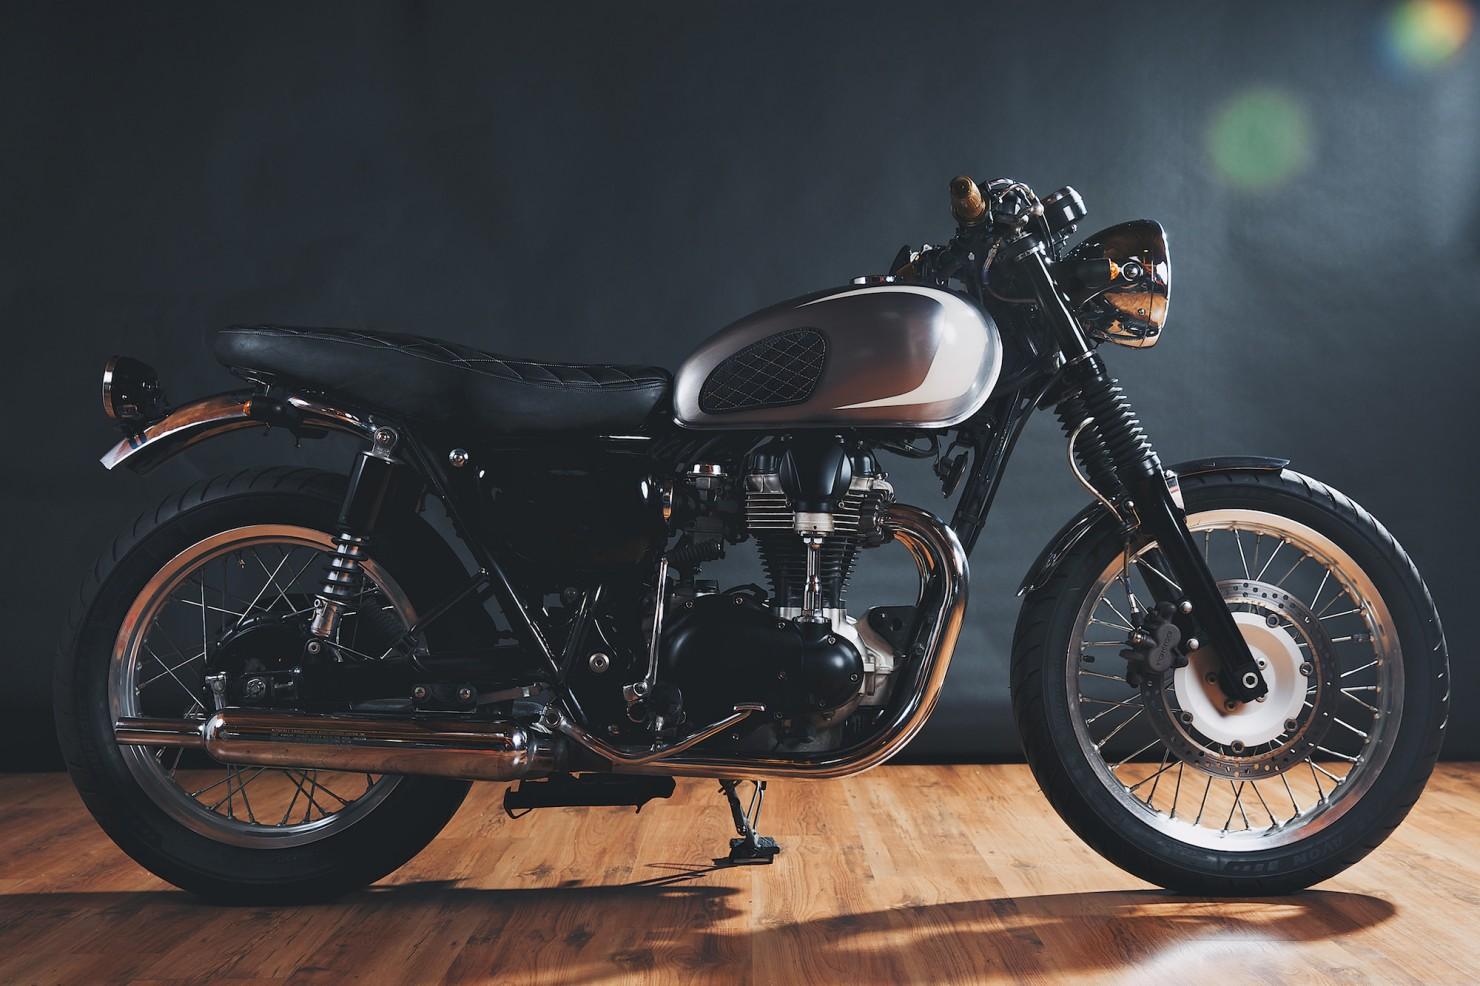 Kawasaki W650 Motorcycle 7 1480x986 Kawasaki W650